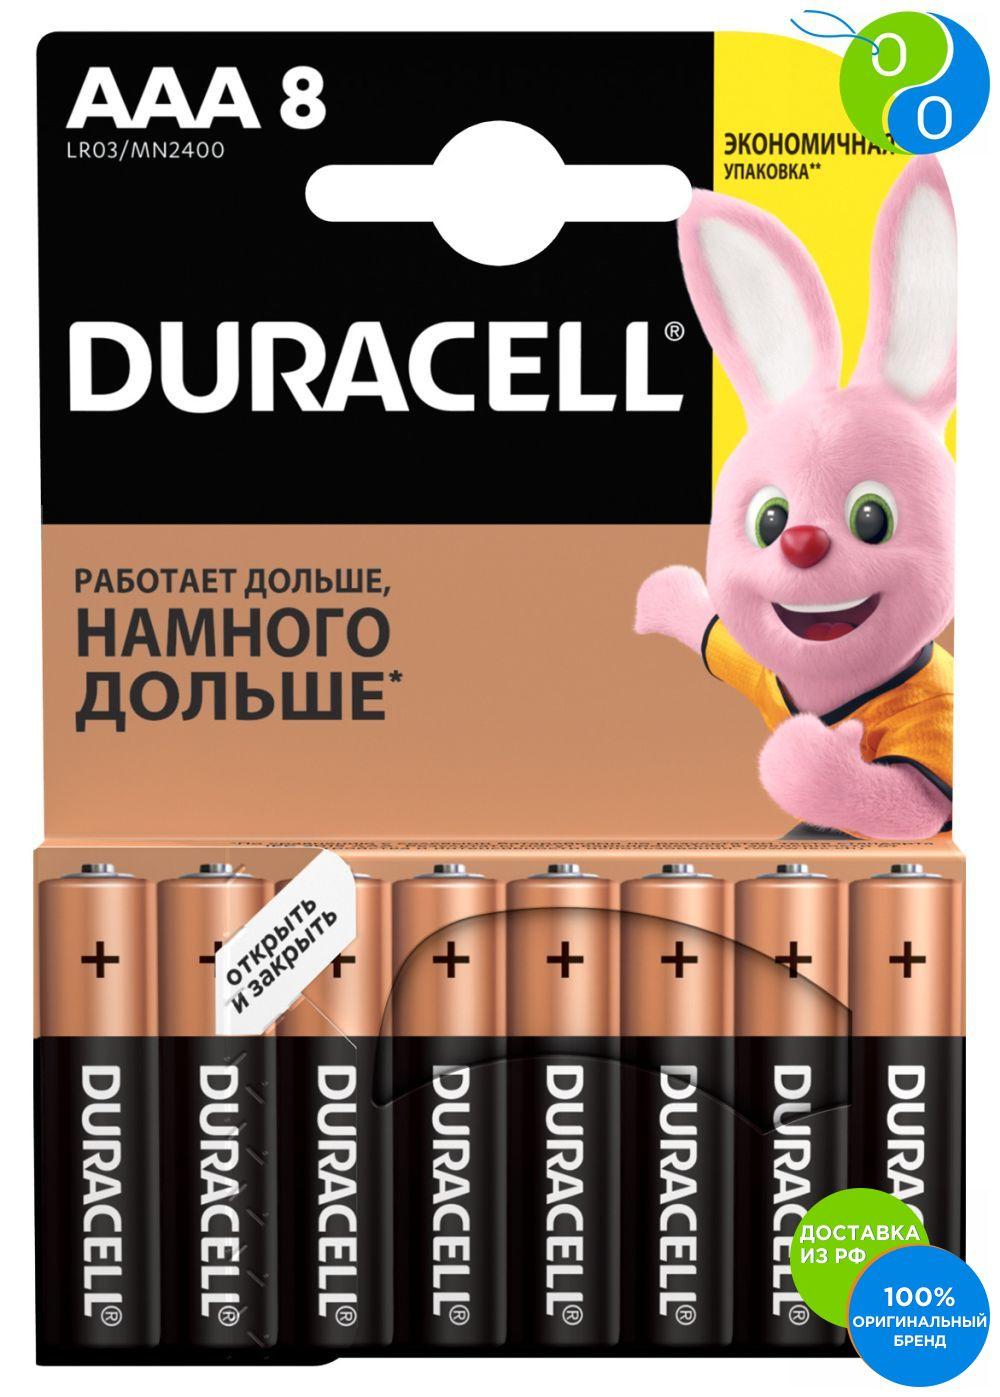 DURACELL Basic AAA Alkaline Batteries LR03 8pcs,Duracel, Durasell, Durasel, Dyracell, Dyracel, Dyrasell, Durasel, Duracell Alkaline battery AAA size, 8 pcs. in the package description Duracell offers a wide range of ba стоимость